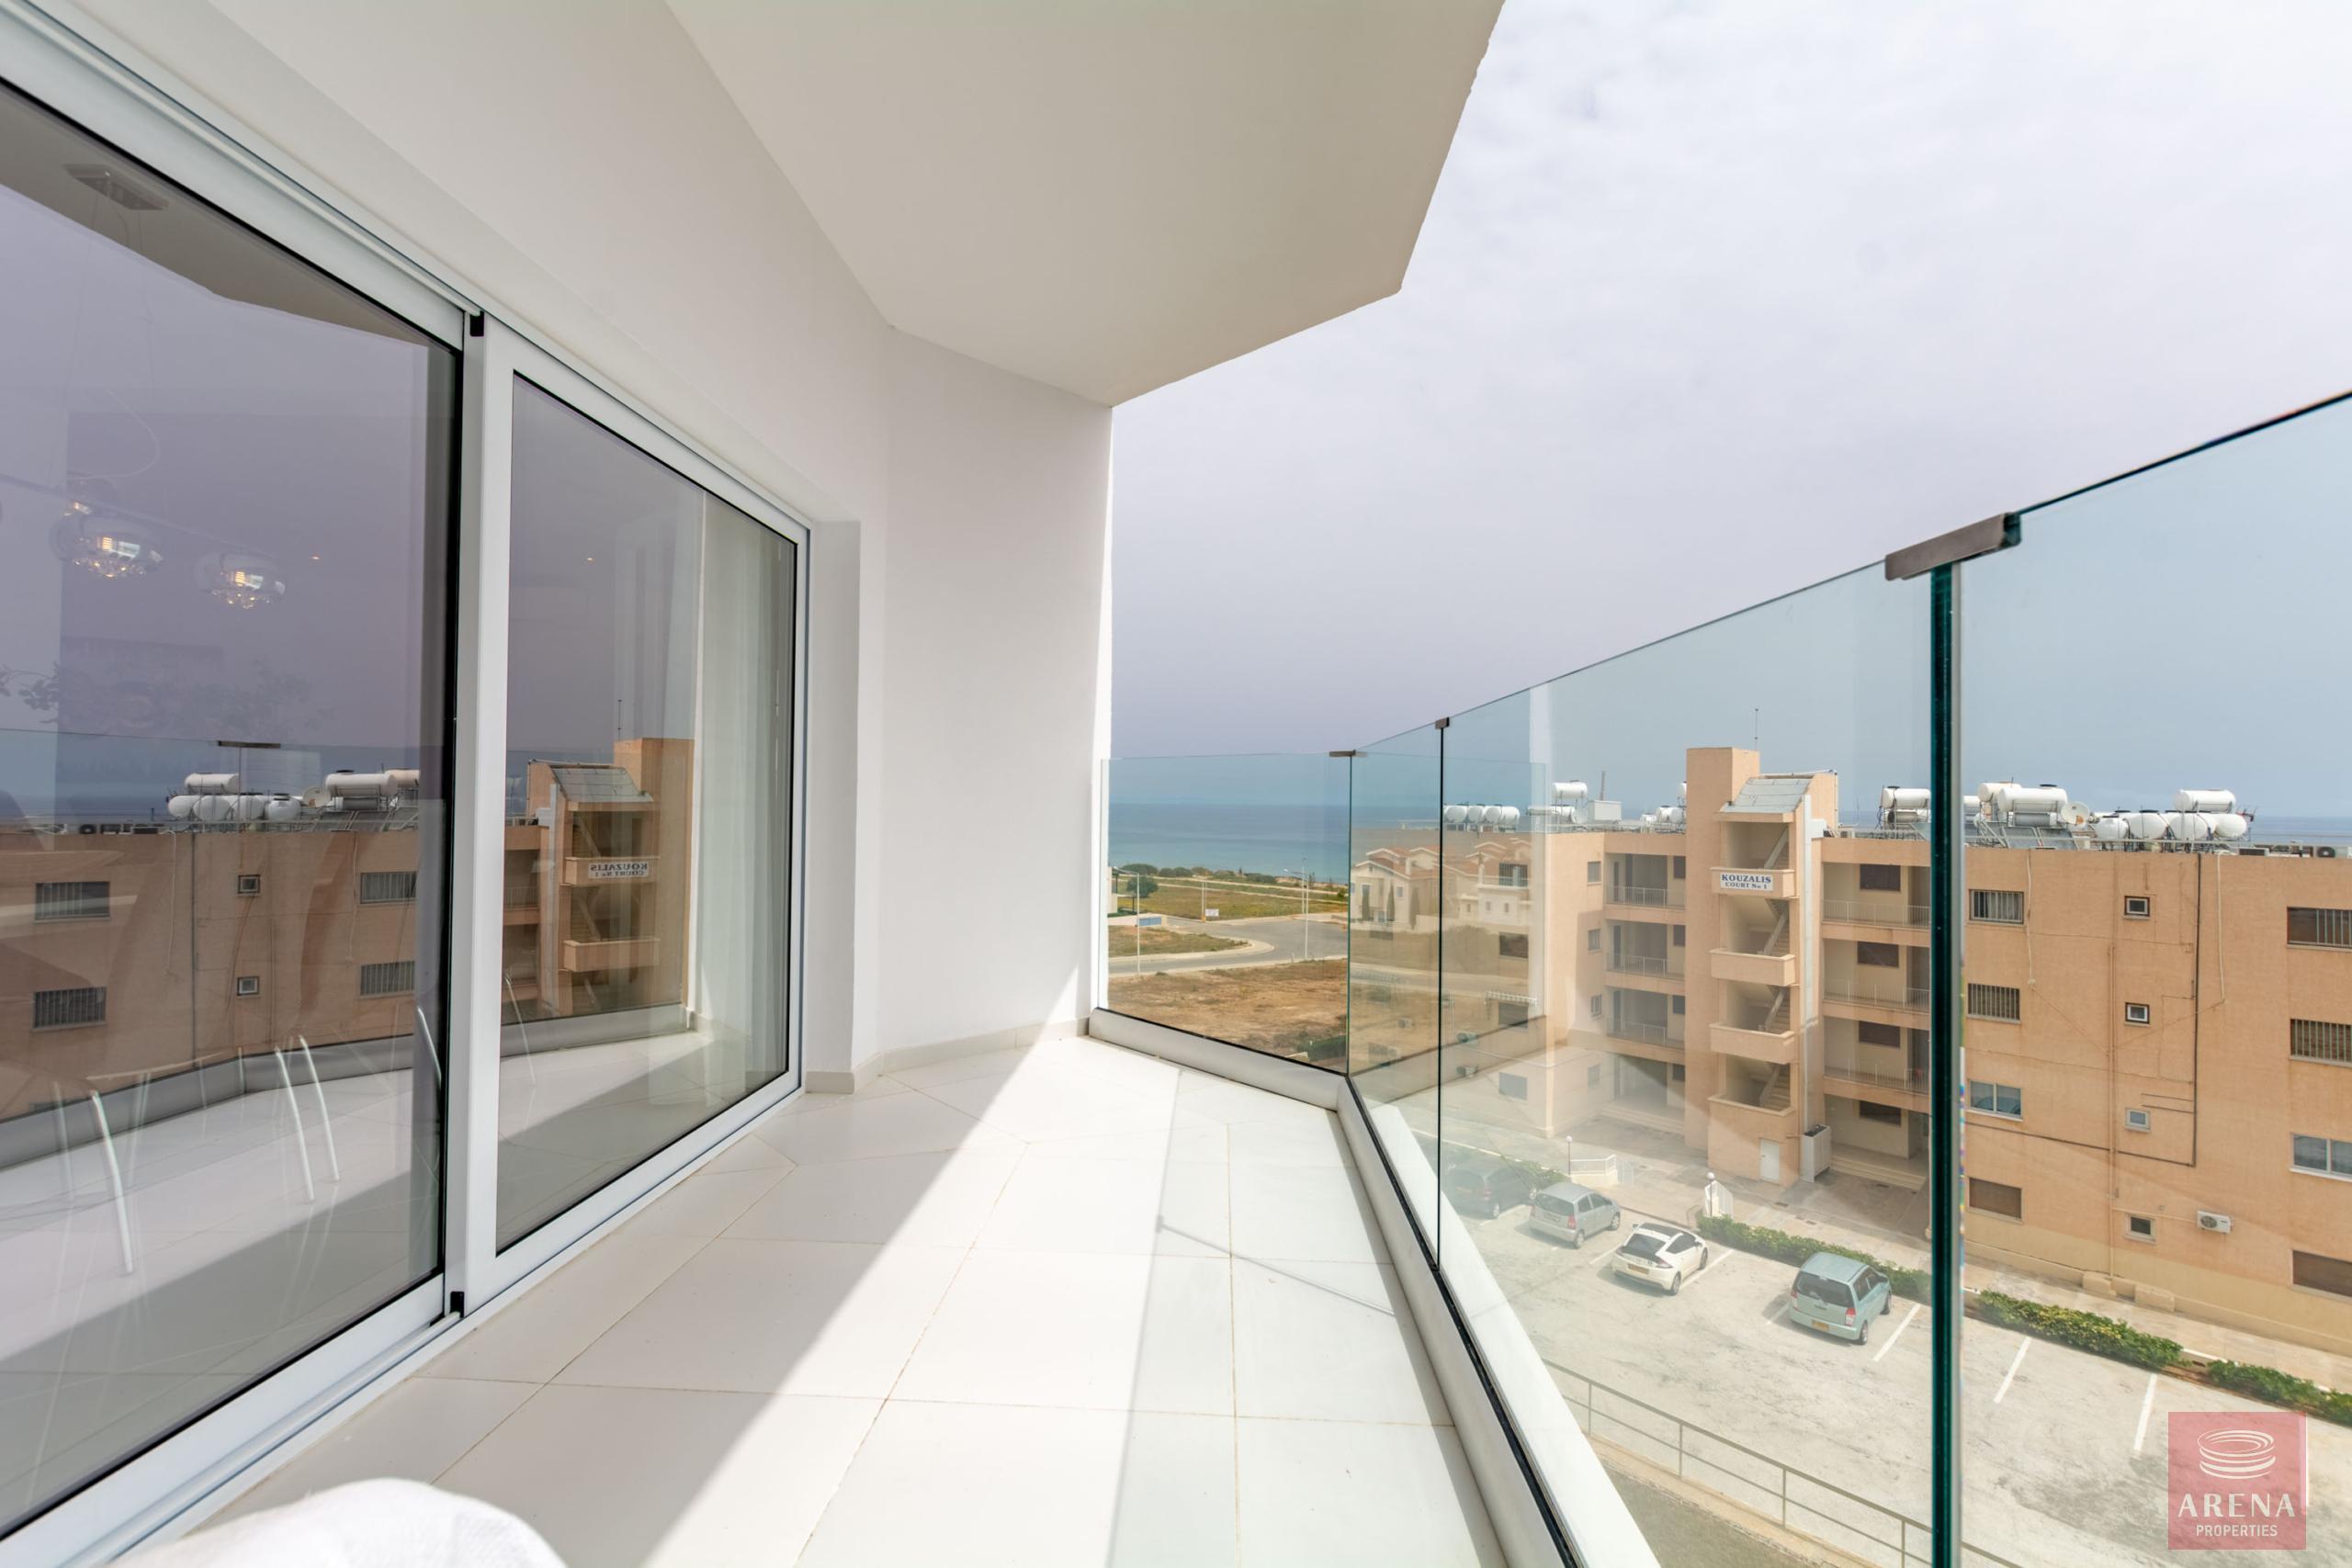 Apartment in Ayia Triada - balcony